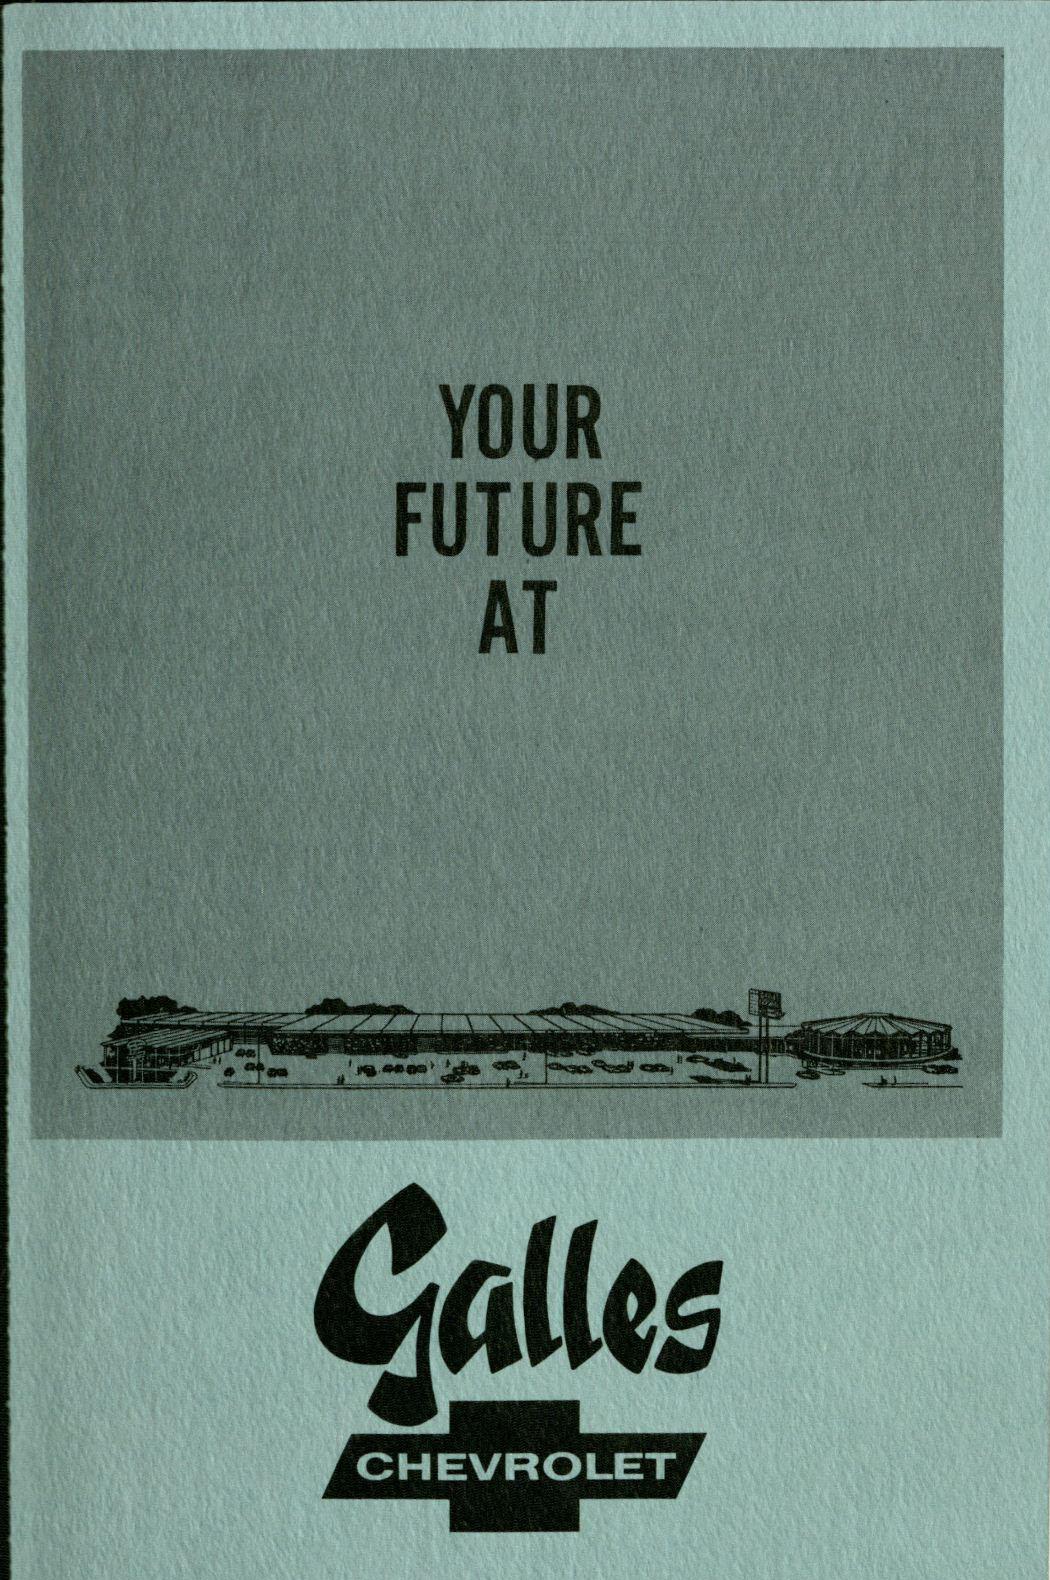 Car Dealerships In Albuquerque Nm >> Galles Motor Company | Albuquerque Modernism